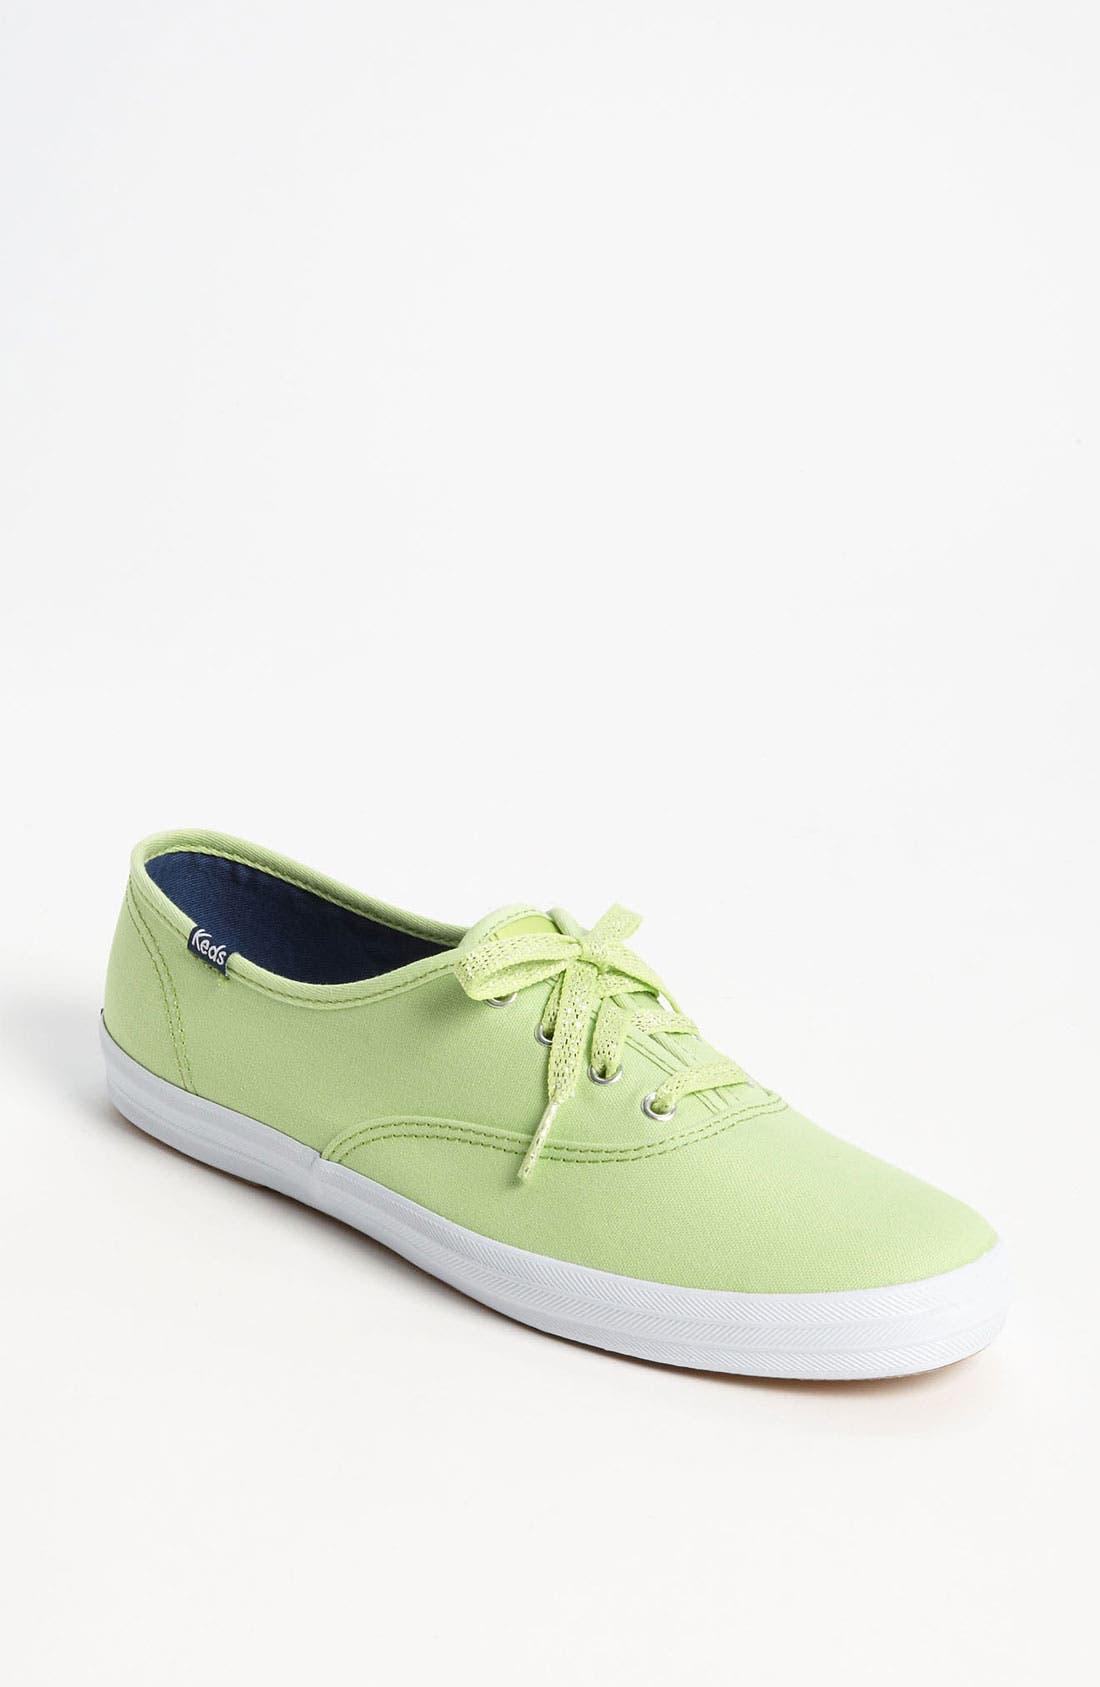 Main Image - Keds® 'Champion - Bright' Sneaker (Women)